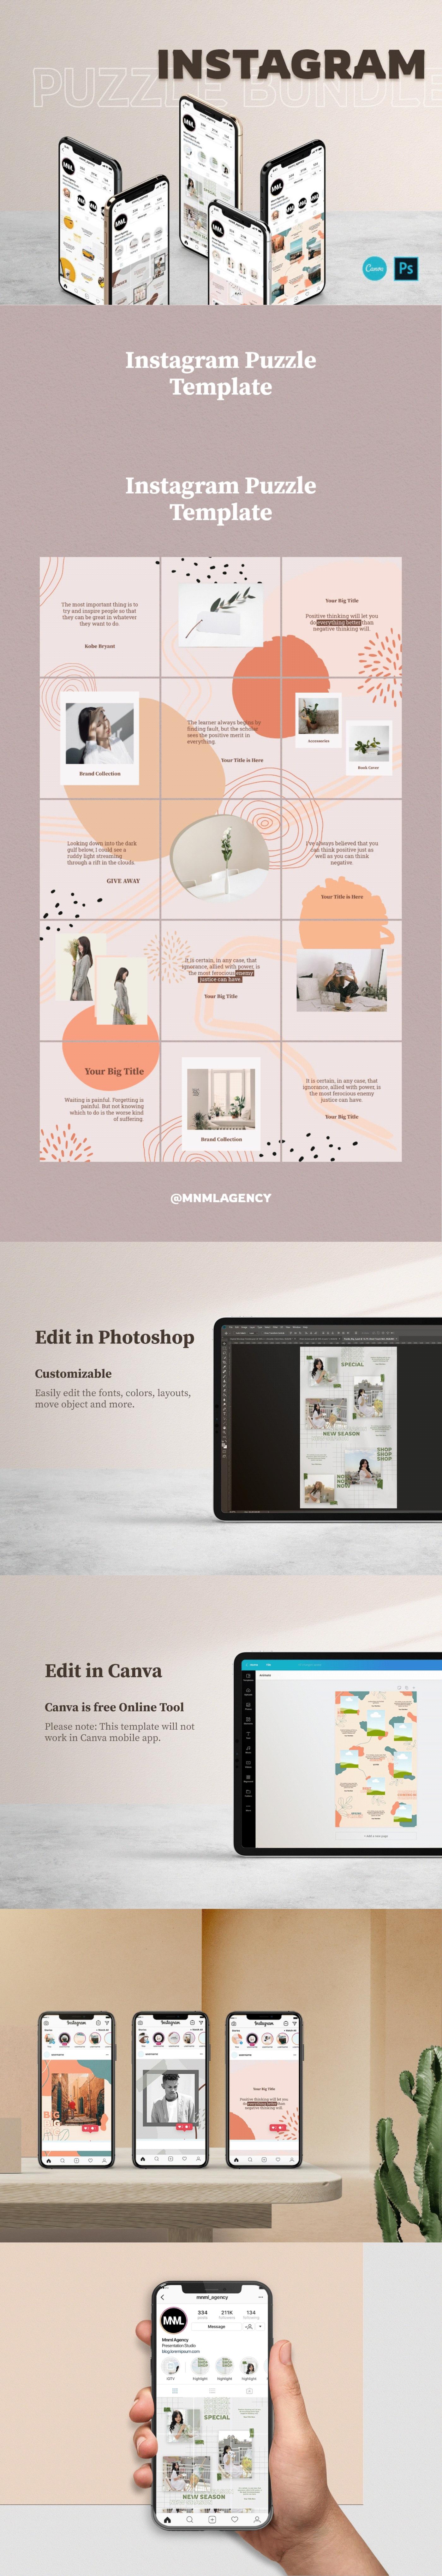 design free images instagram posts potos puzzle social media template templates